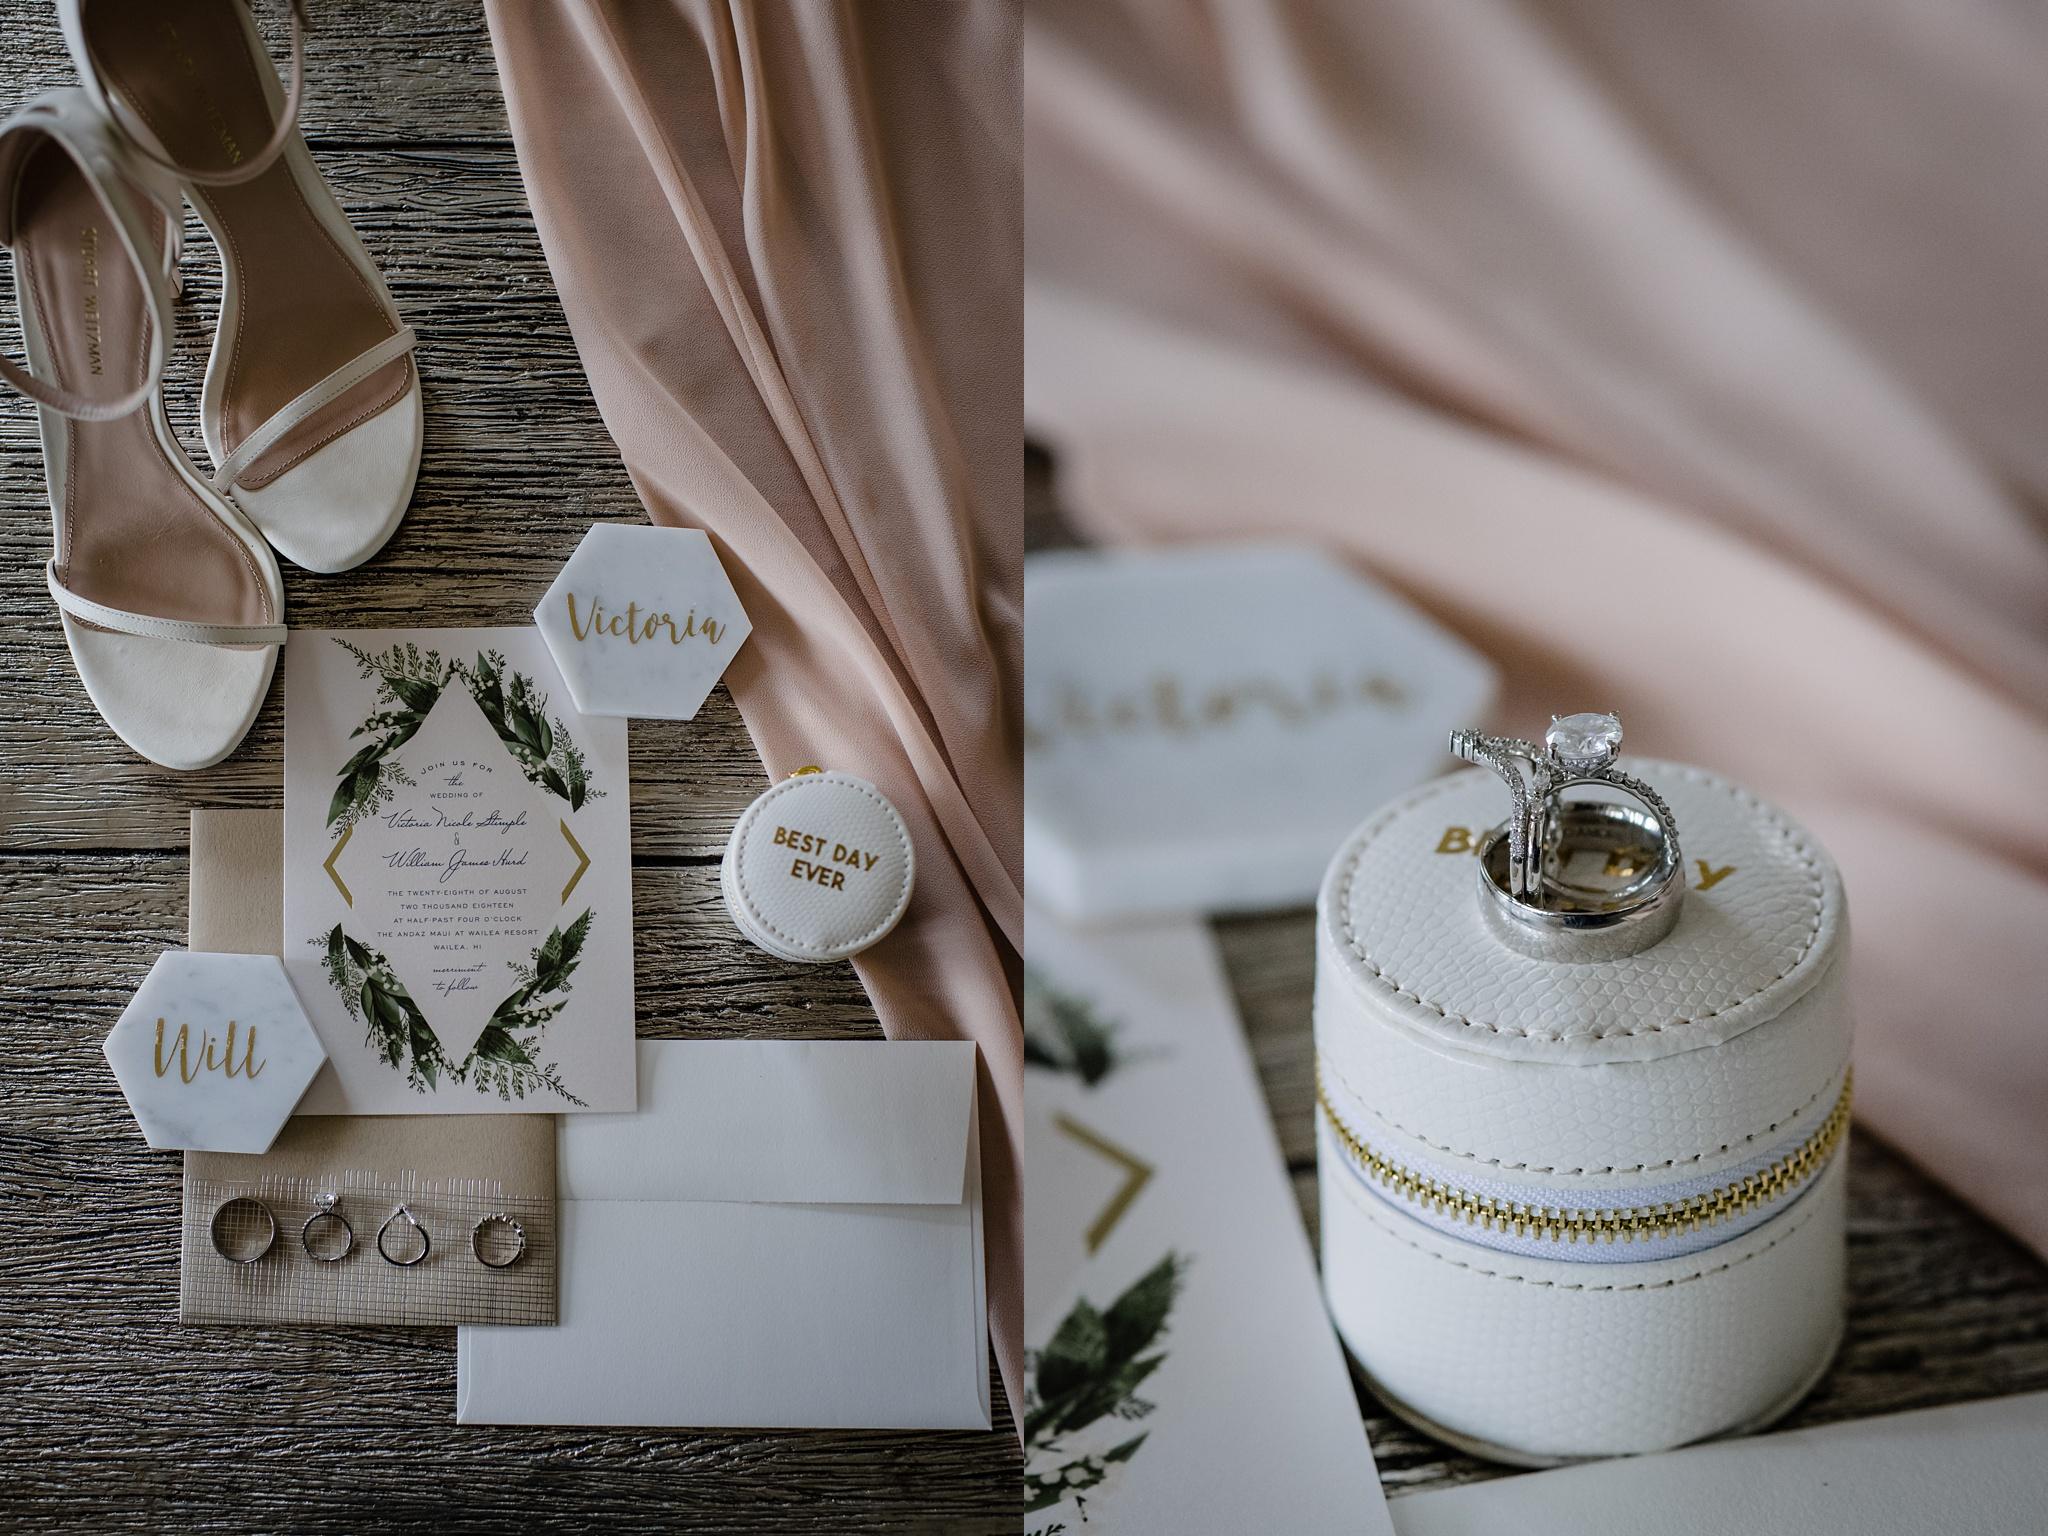 Wedding details from a Maui wedding